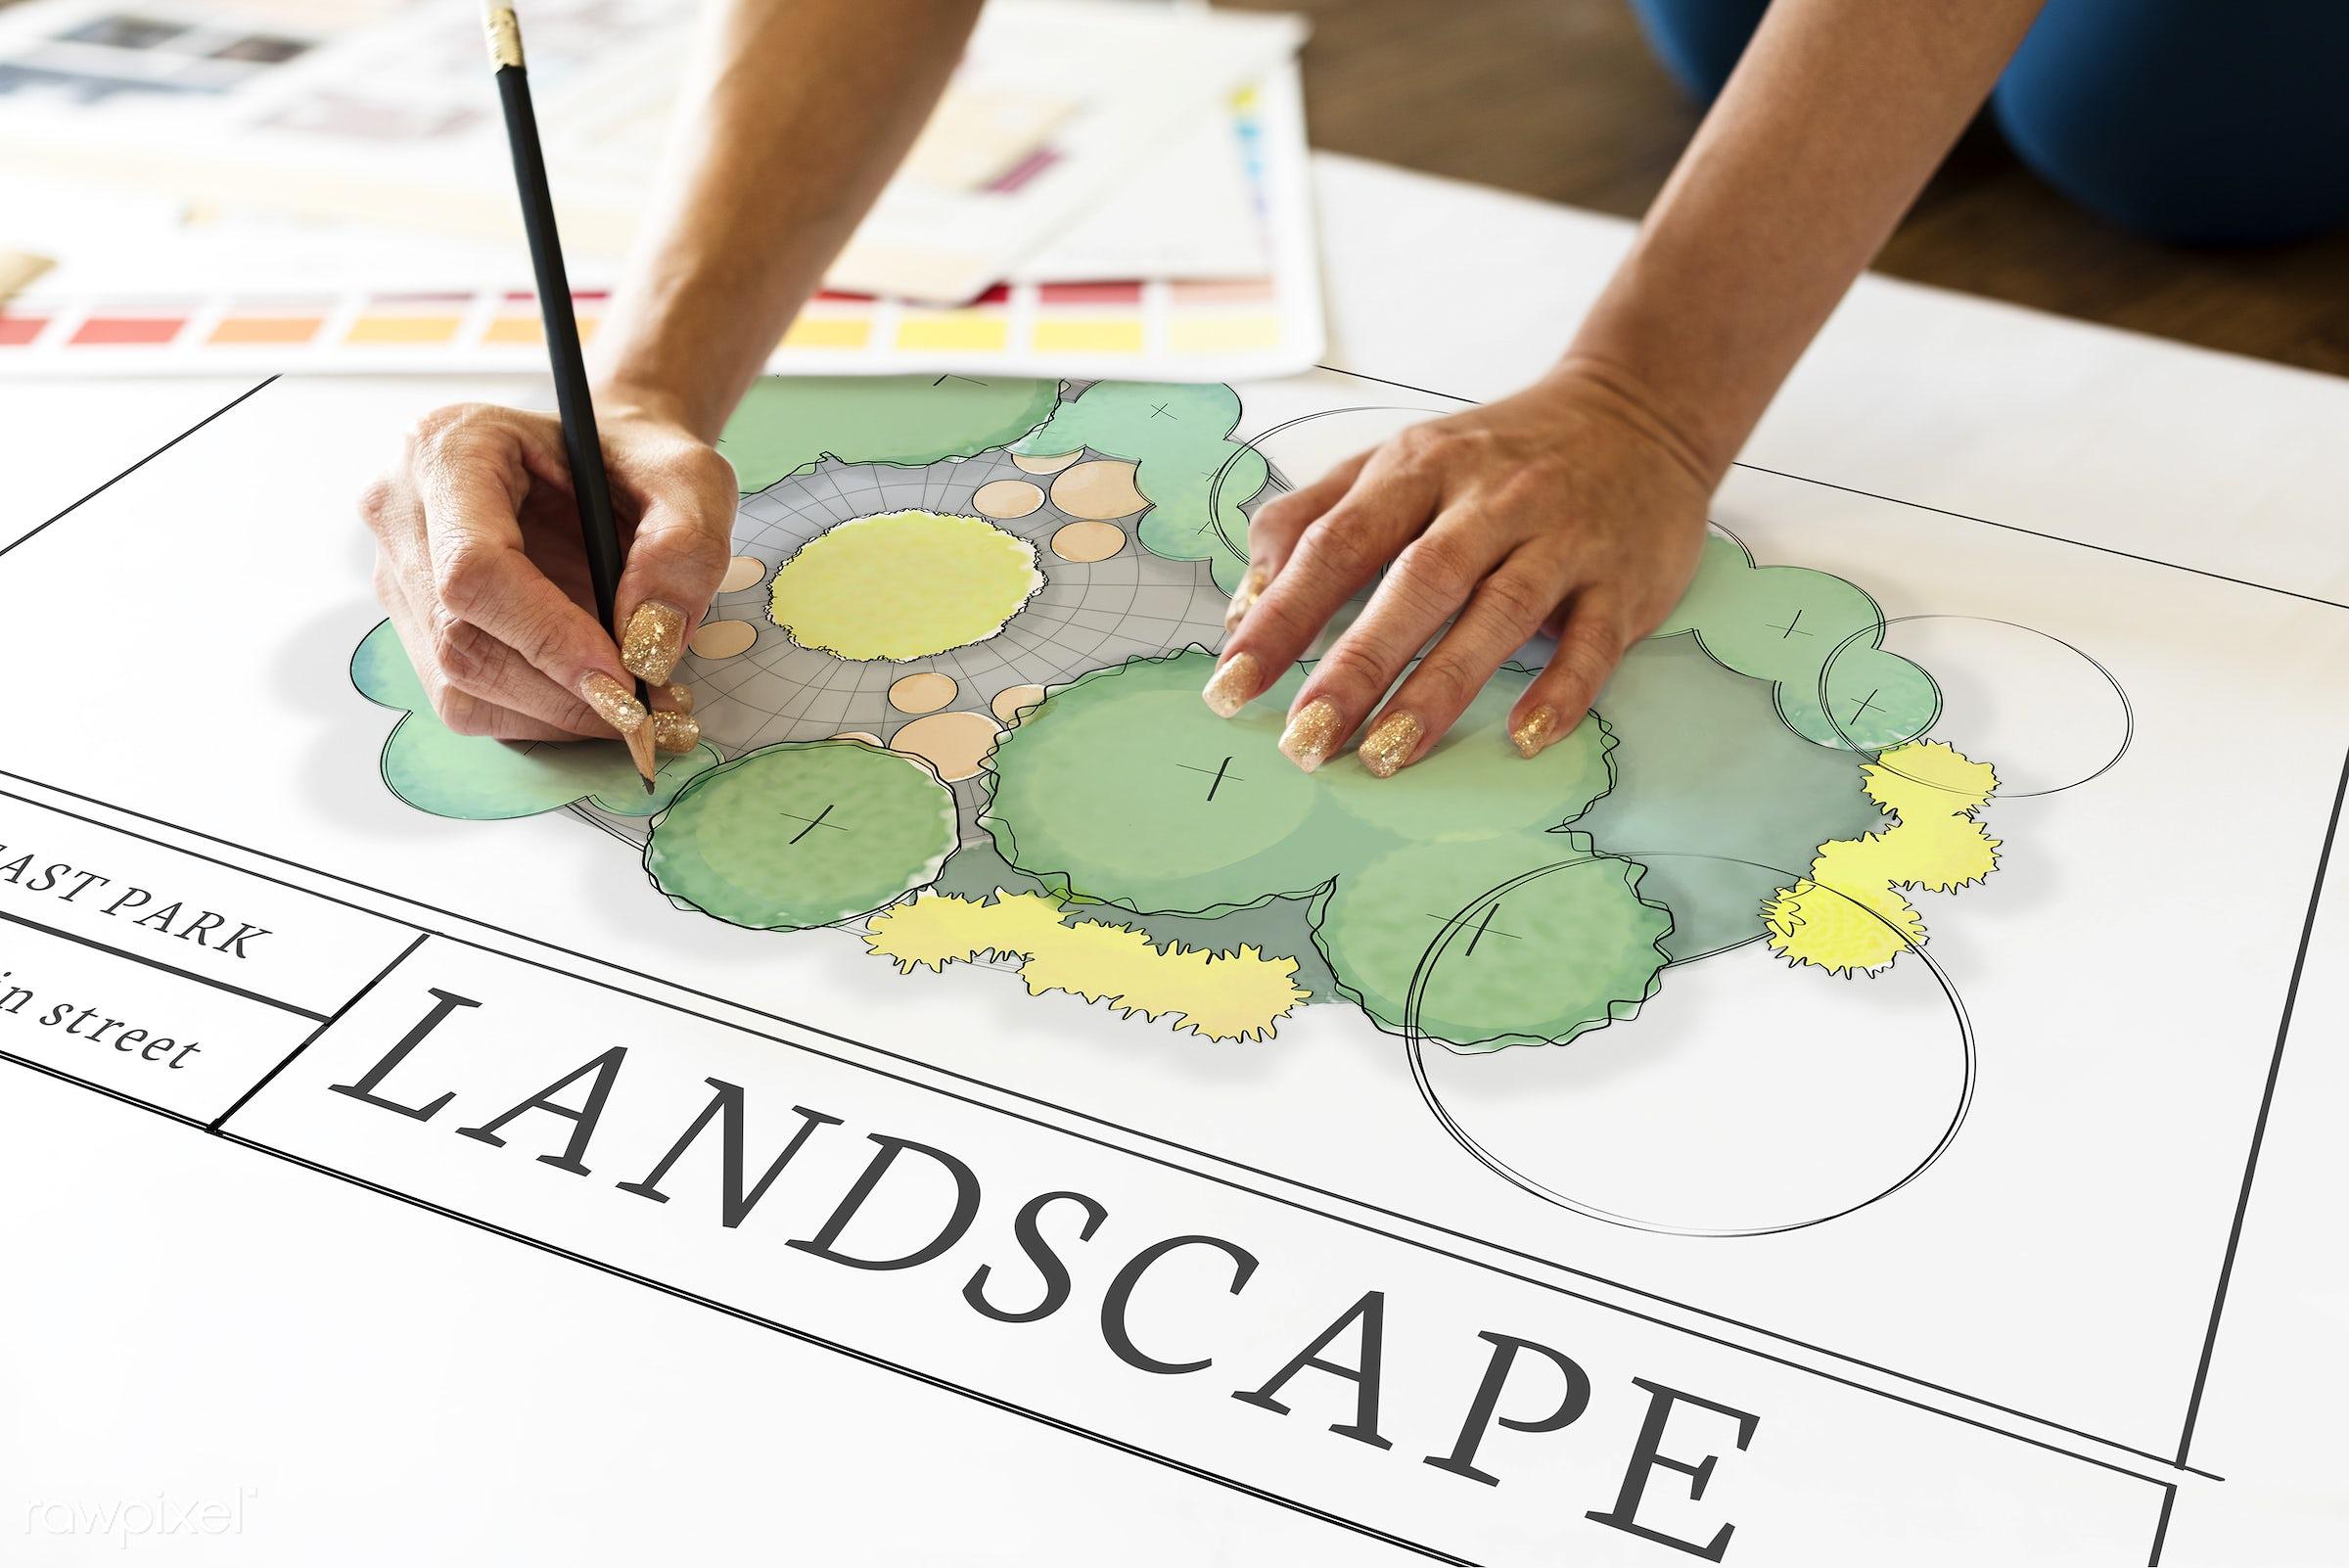 architect, architecture, art, blueprint, concept, creation, creative, creativity, design, drawing, graphic, hands, ideas,...